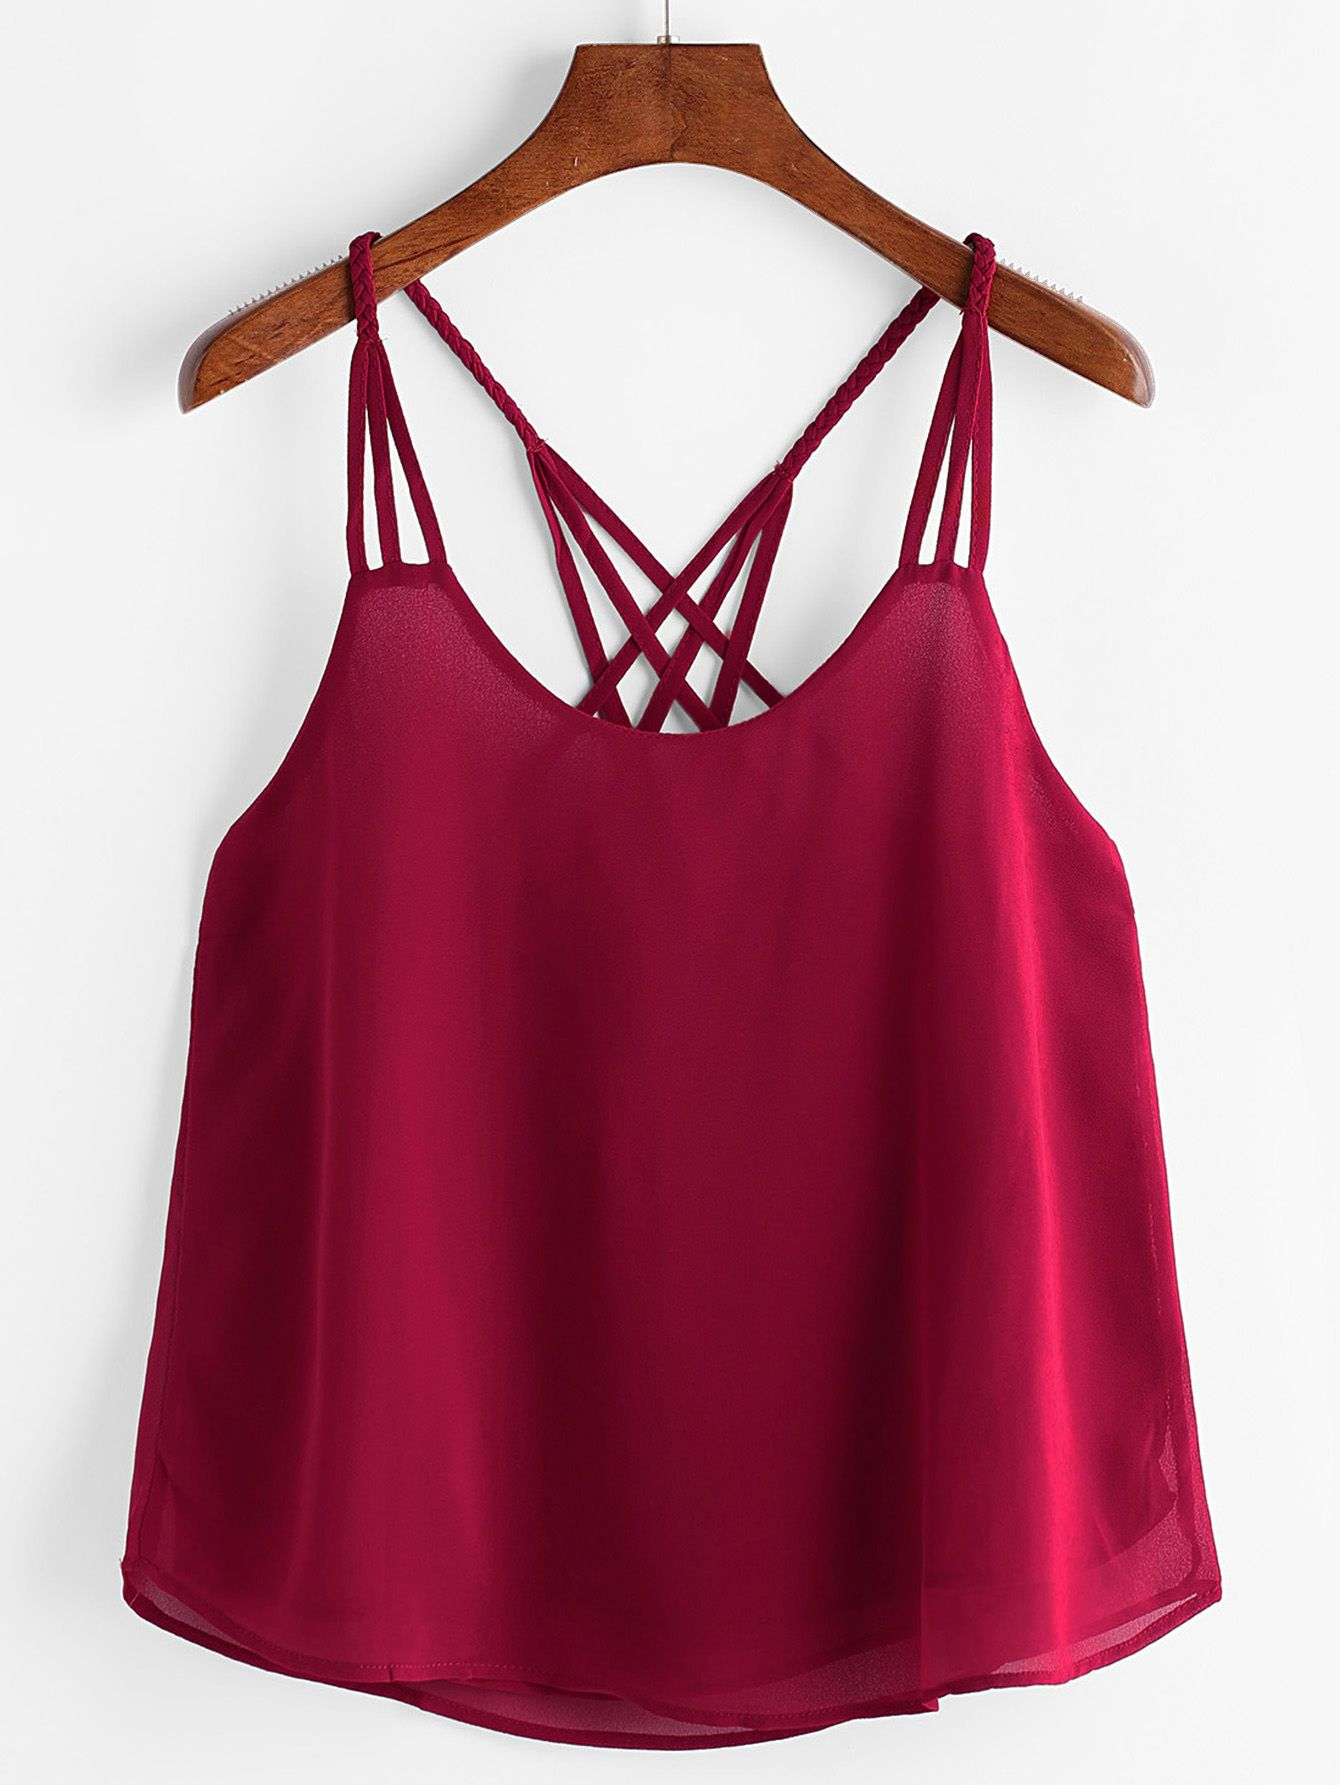 70163446ab78a Shop Lattice Back Cami Top online. SheIn offers Lattice Back Cami Top    more to fit your fashionable needs.